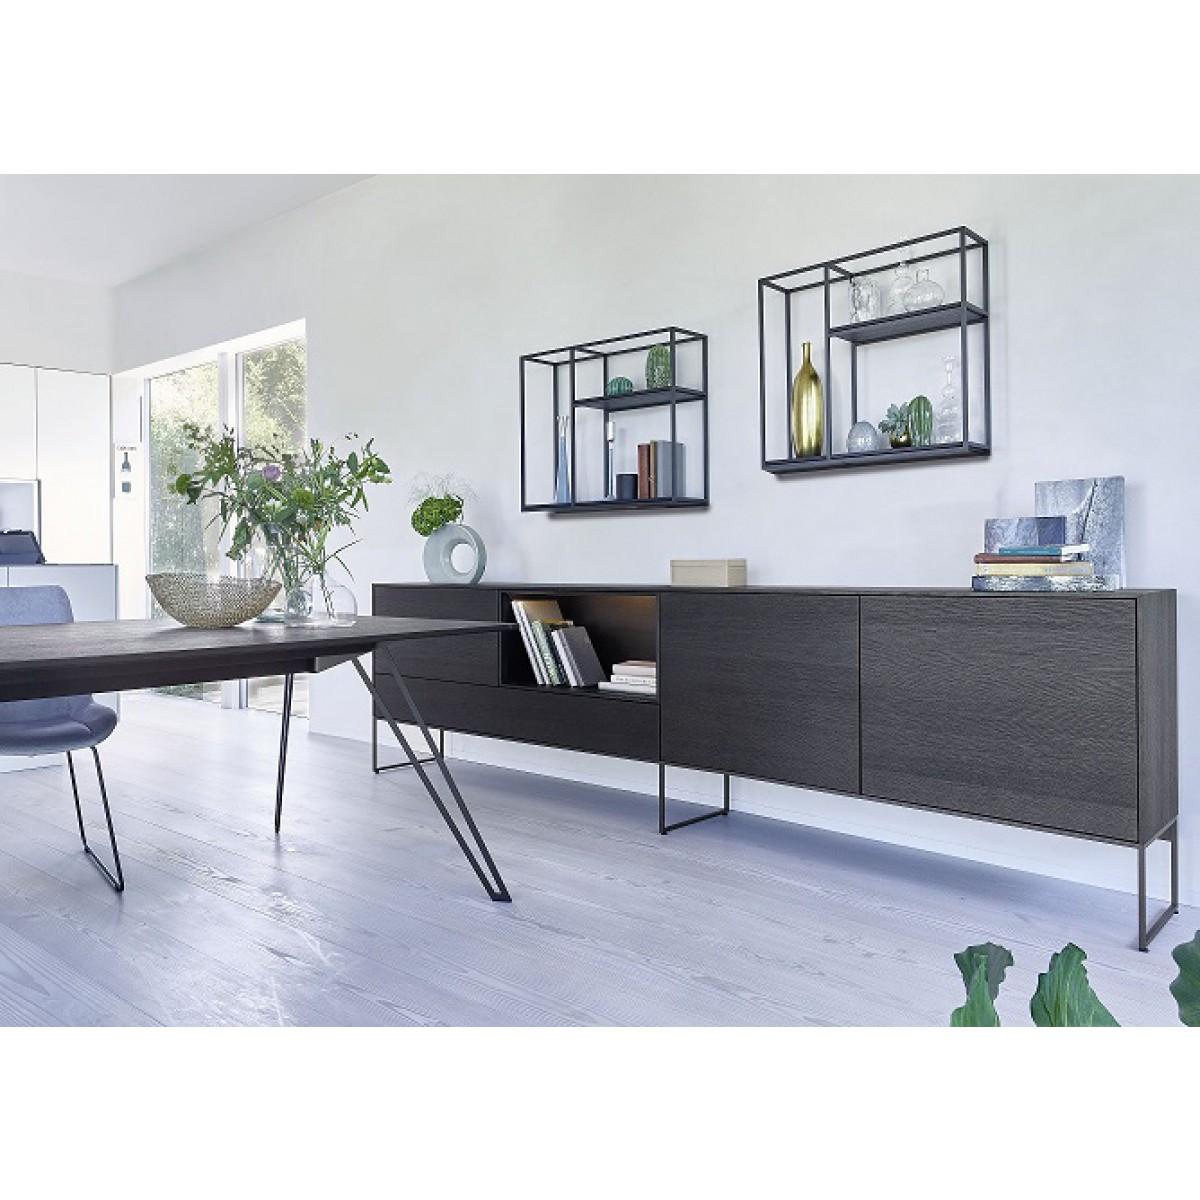 dressoir_Intense_nt5_Mintjens_furniture_miltonhouse_design